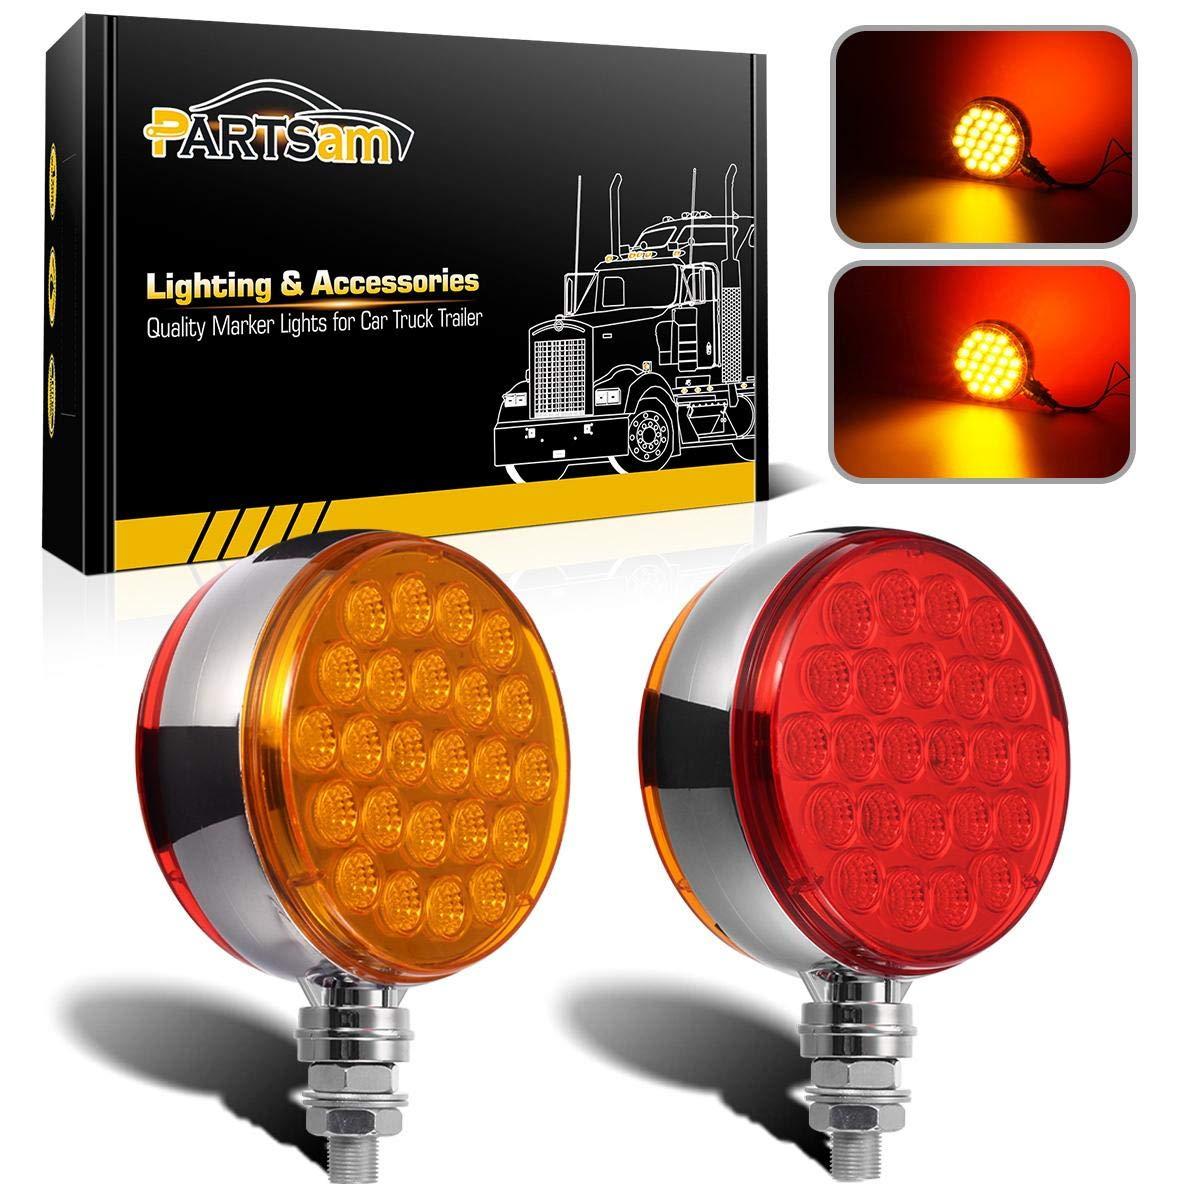 LED Truck Trailer Light Kit Double Face 4pcs 3 Round 24 LED Amber White Red Light Stop Turn Tail Lights for Kenworth Freightliner Peterbilt